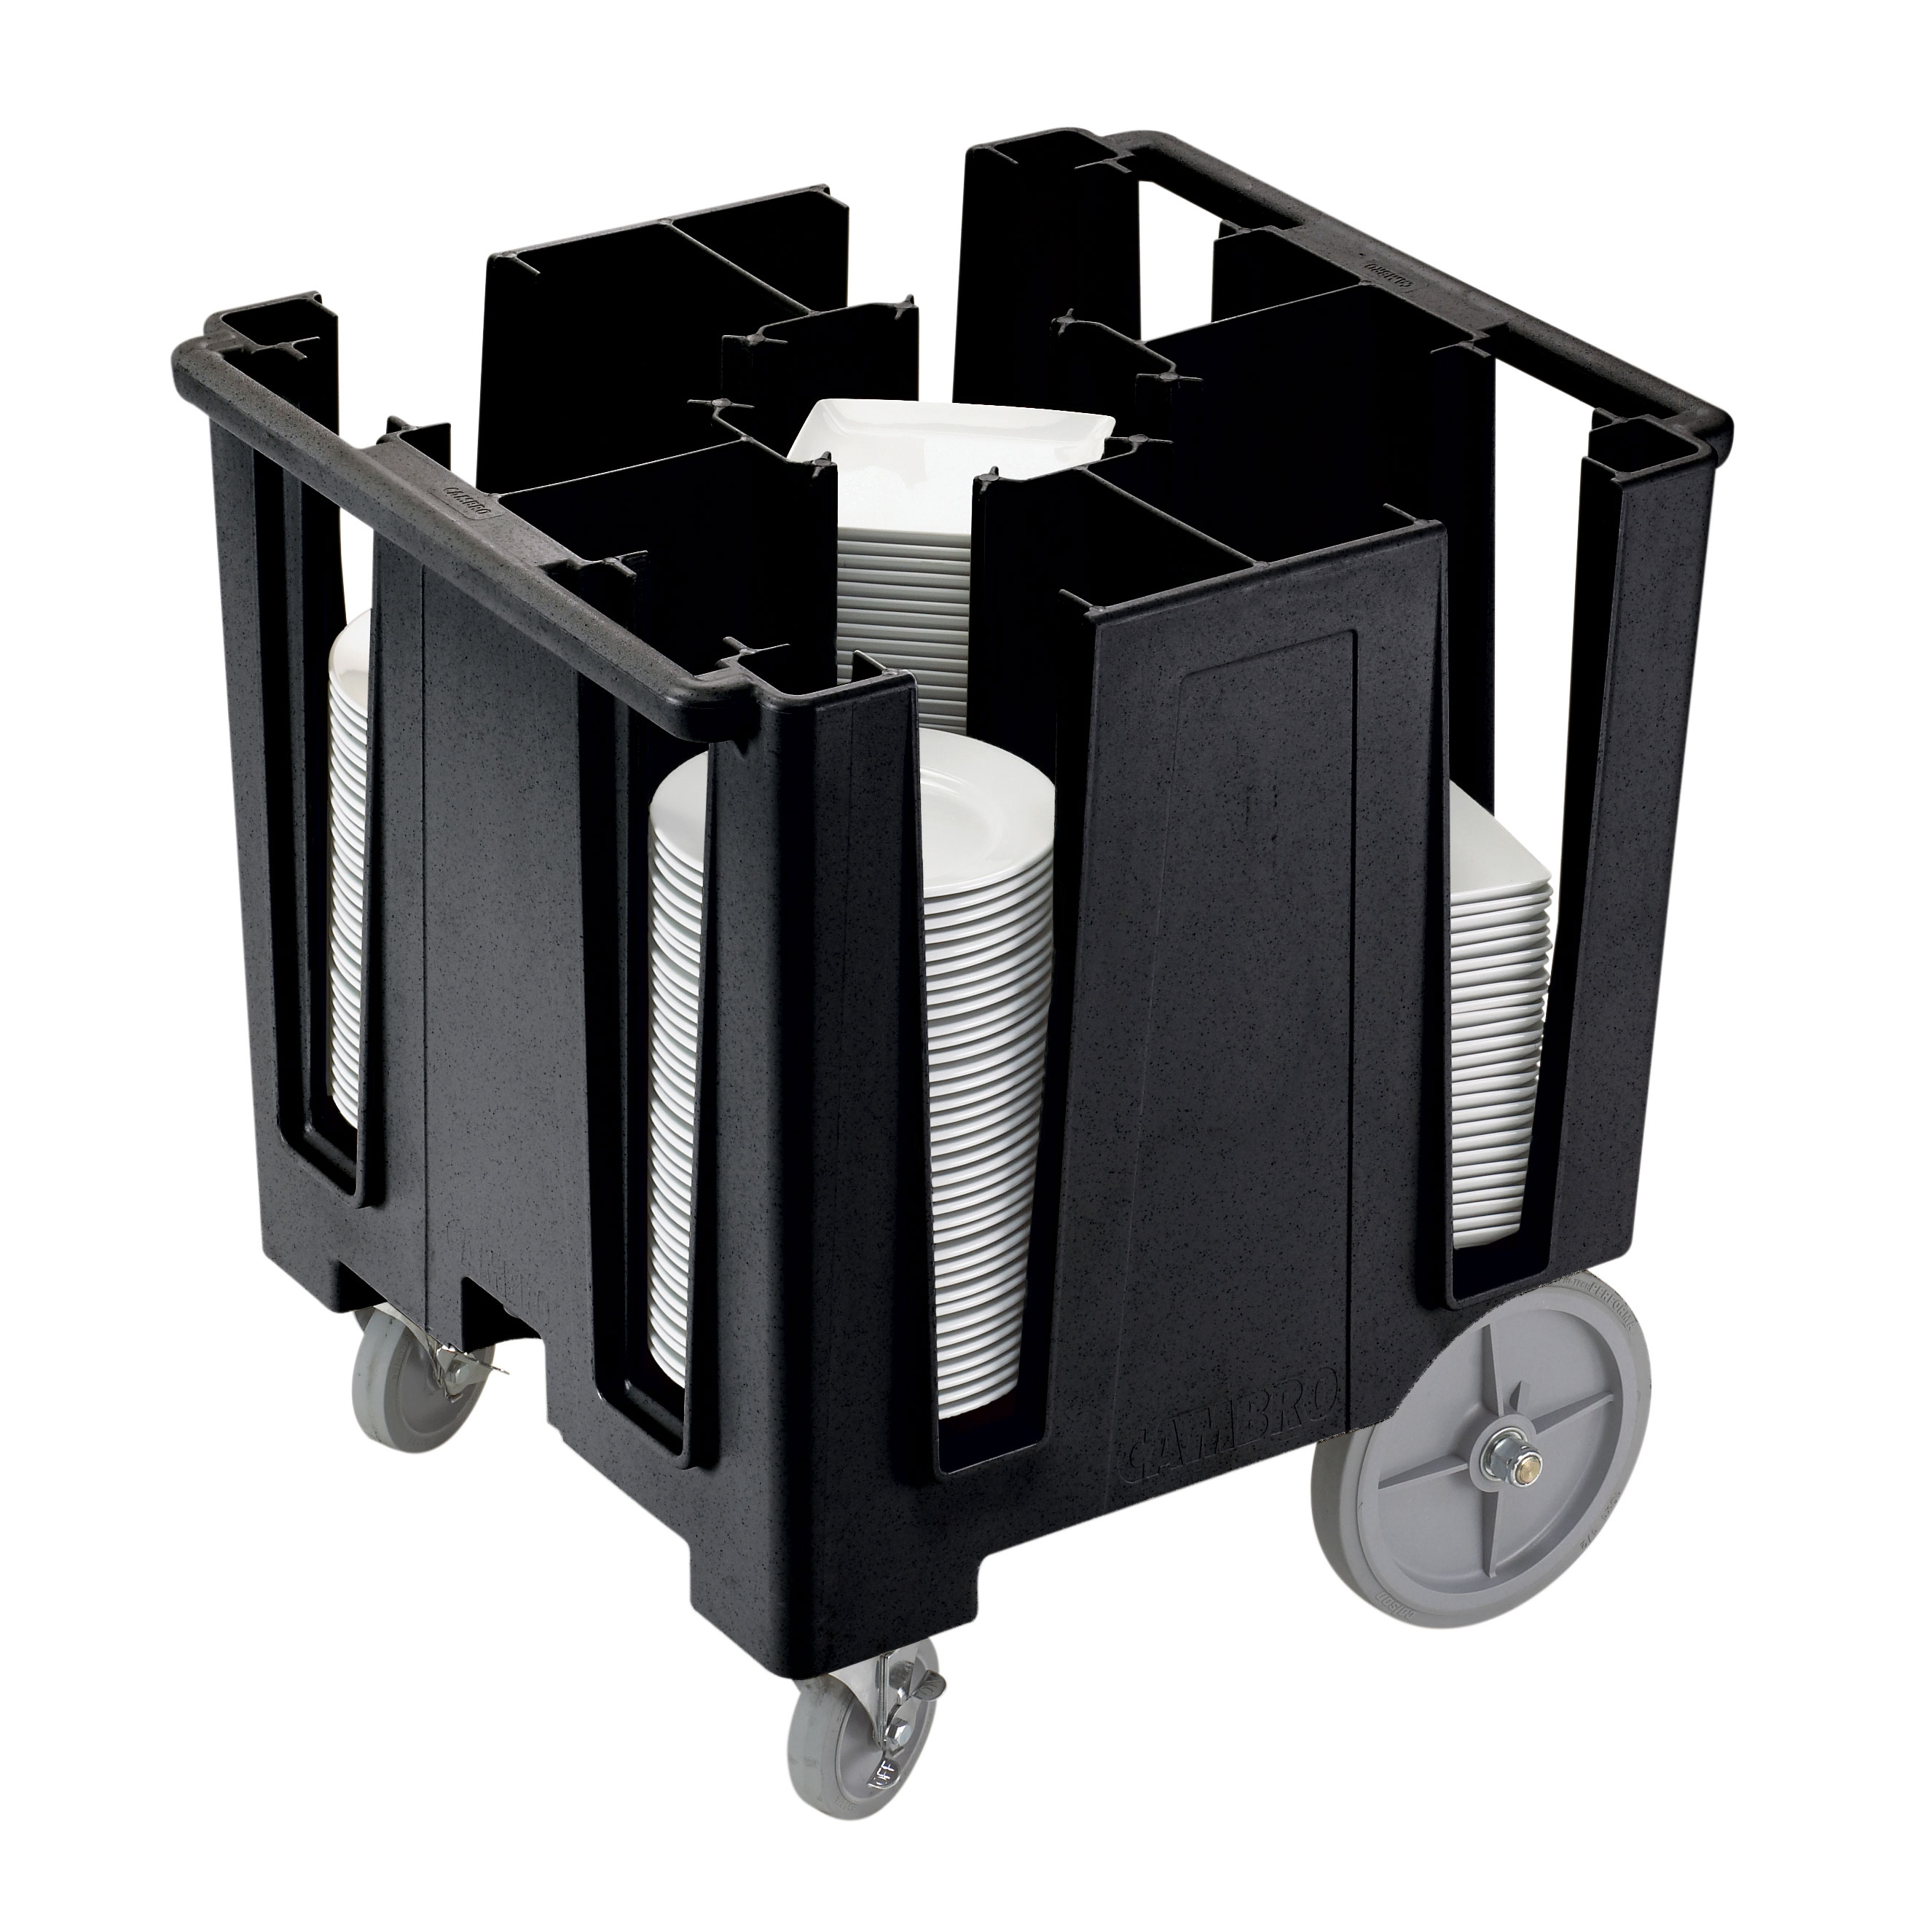 Cambro DCS950110 dish caddies